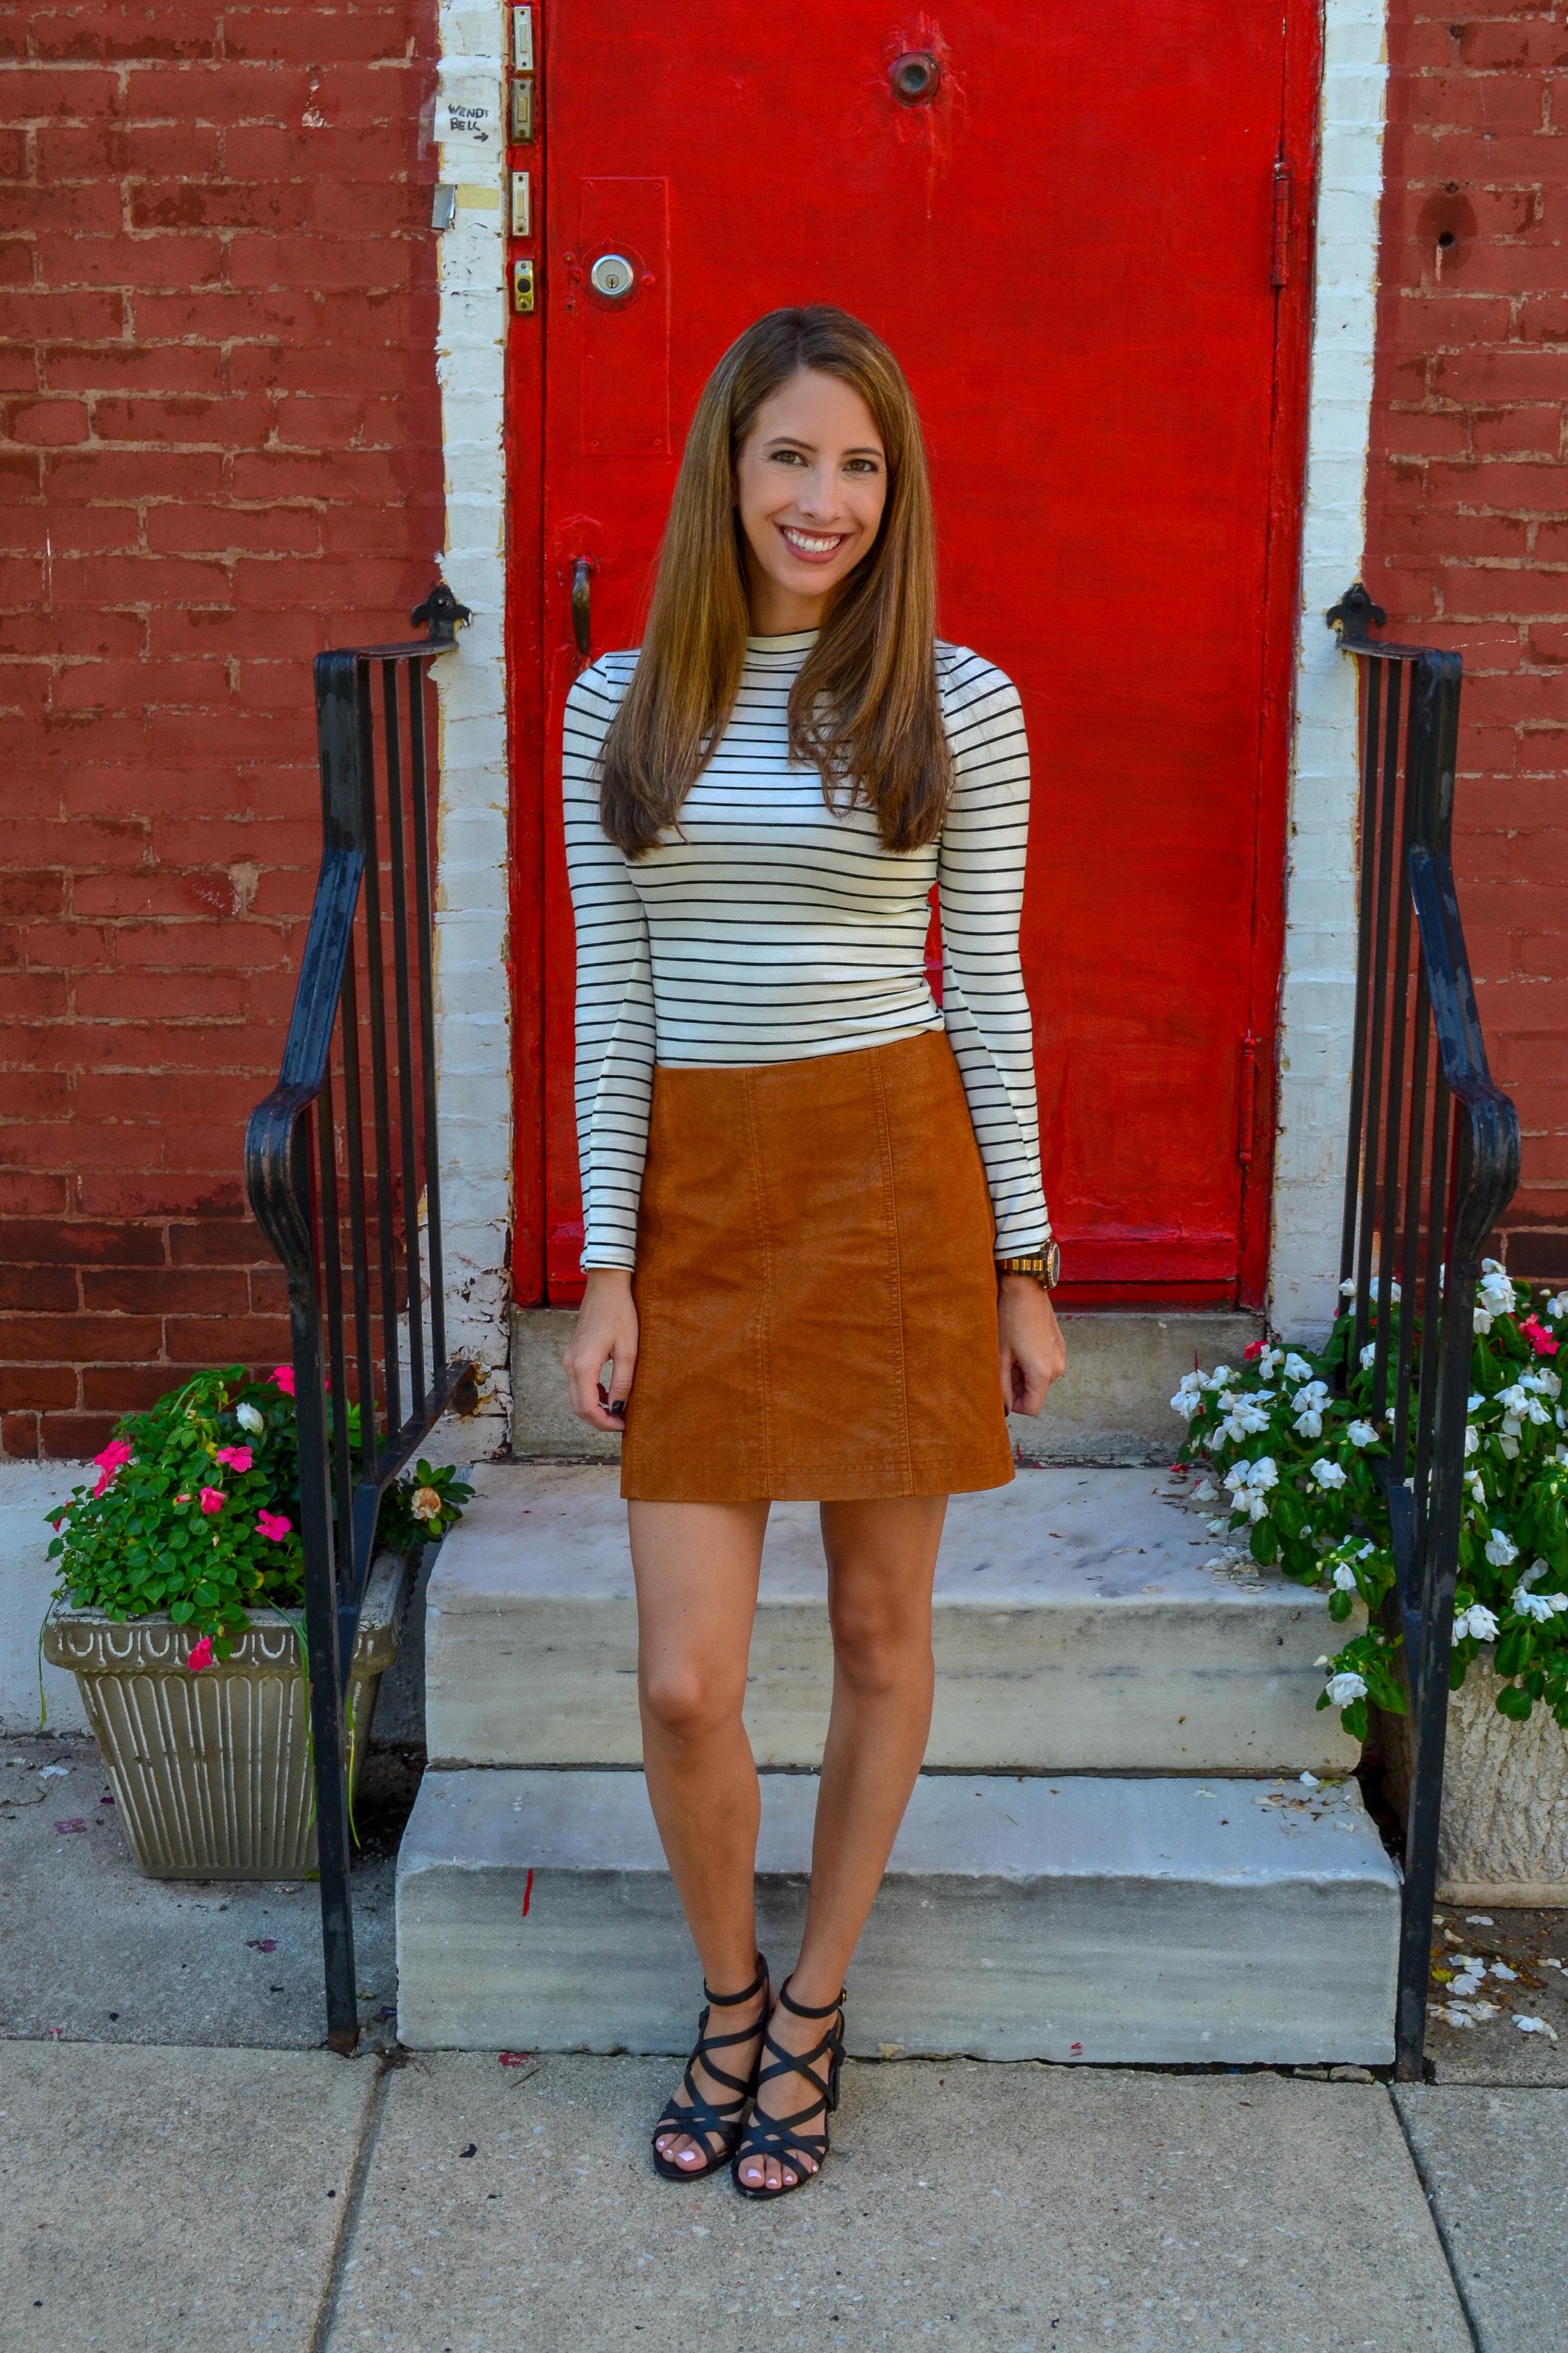 442e8da8ac4 Vegan Suede Mini Skirt with a Chic White Striped Top - Sincerely, K